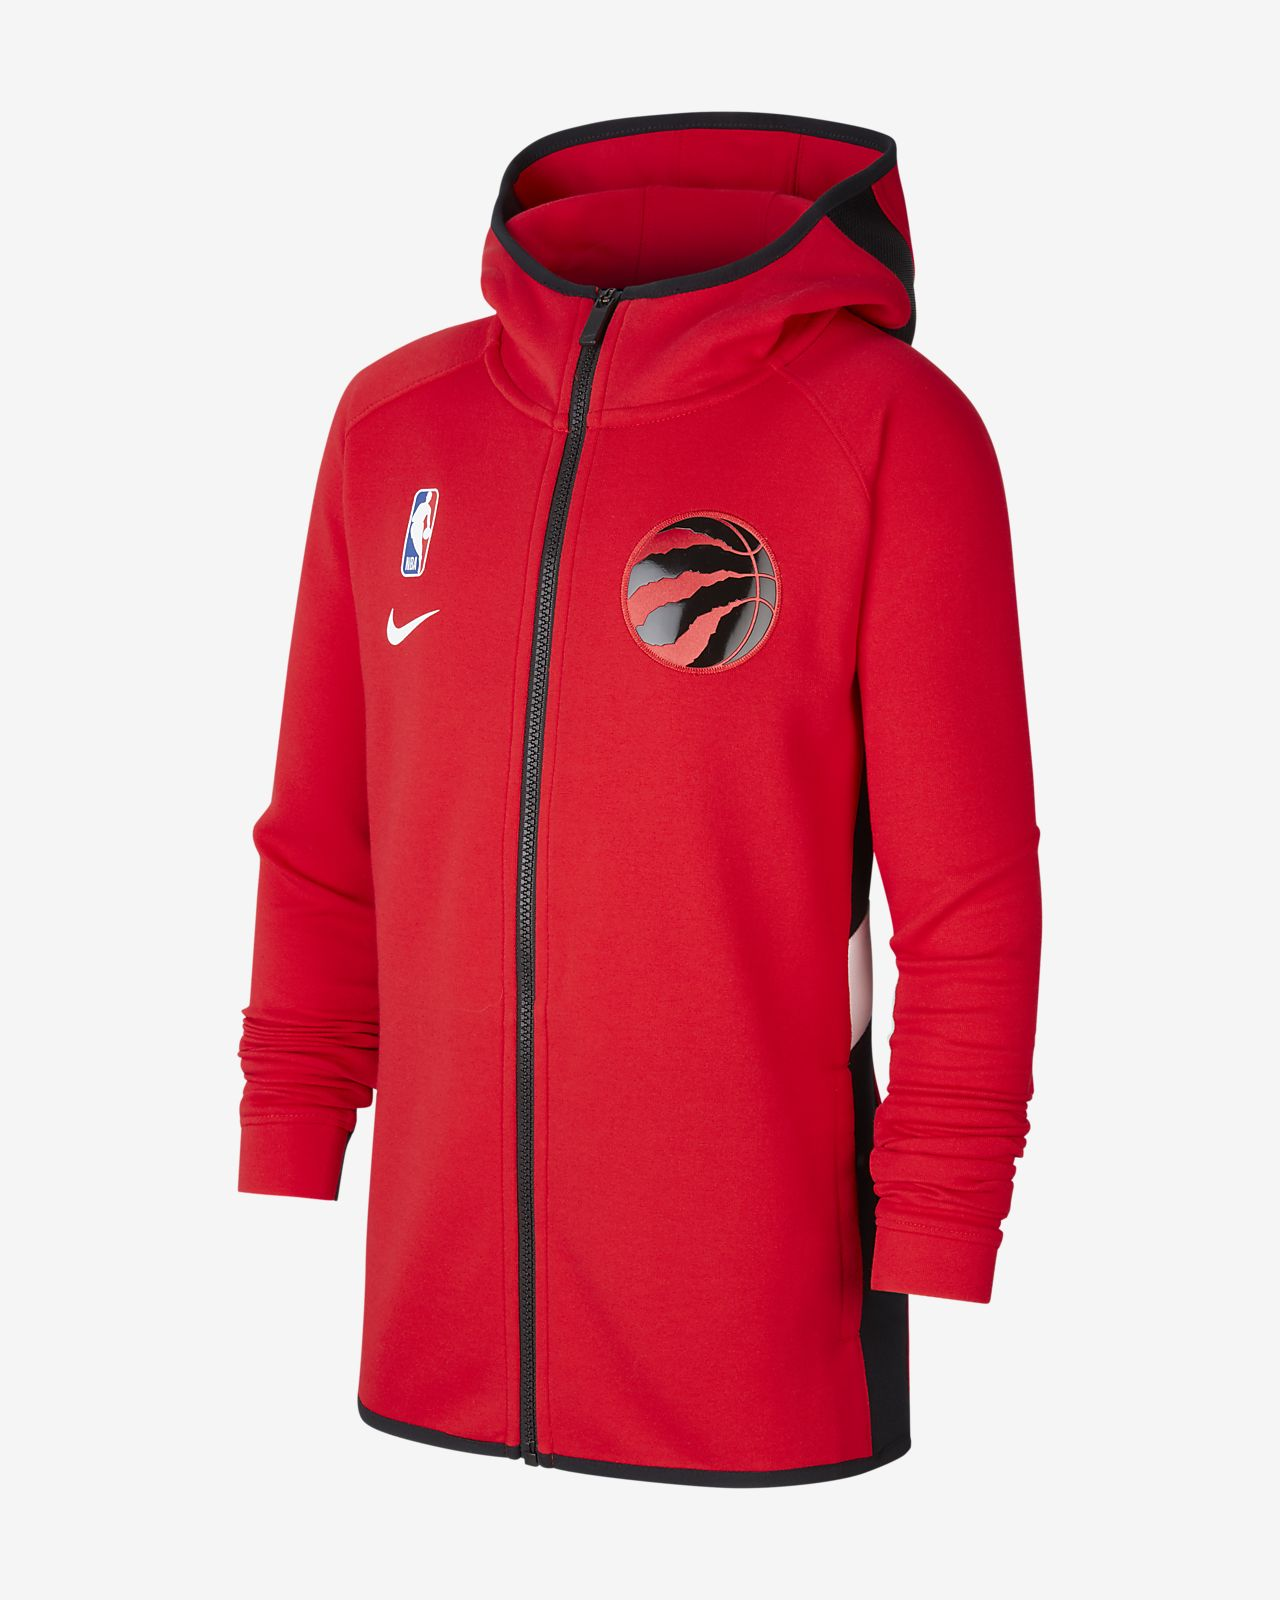 Raptors Showtime Older Kids' Nike Dri FIT NBA Hoodie